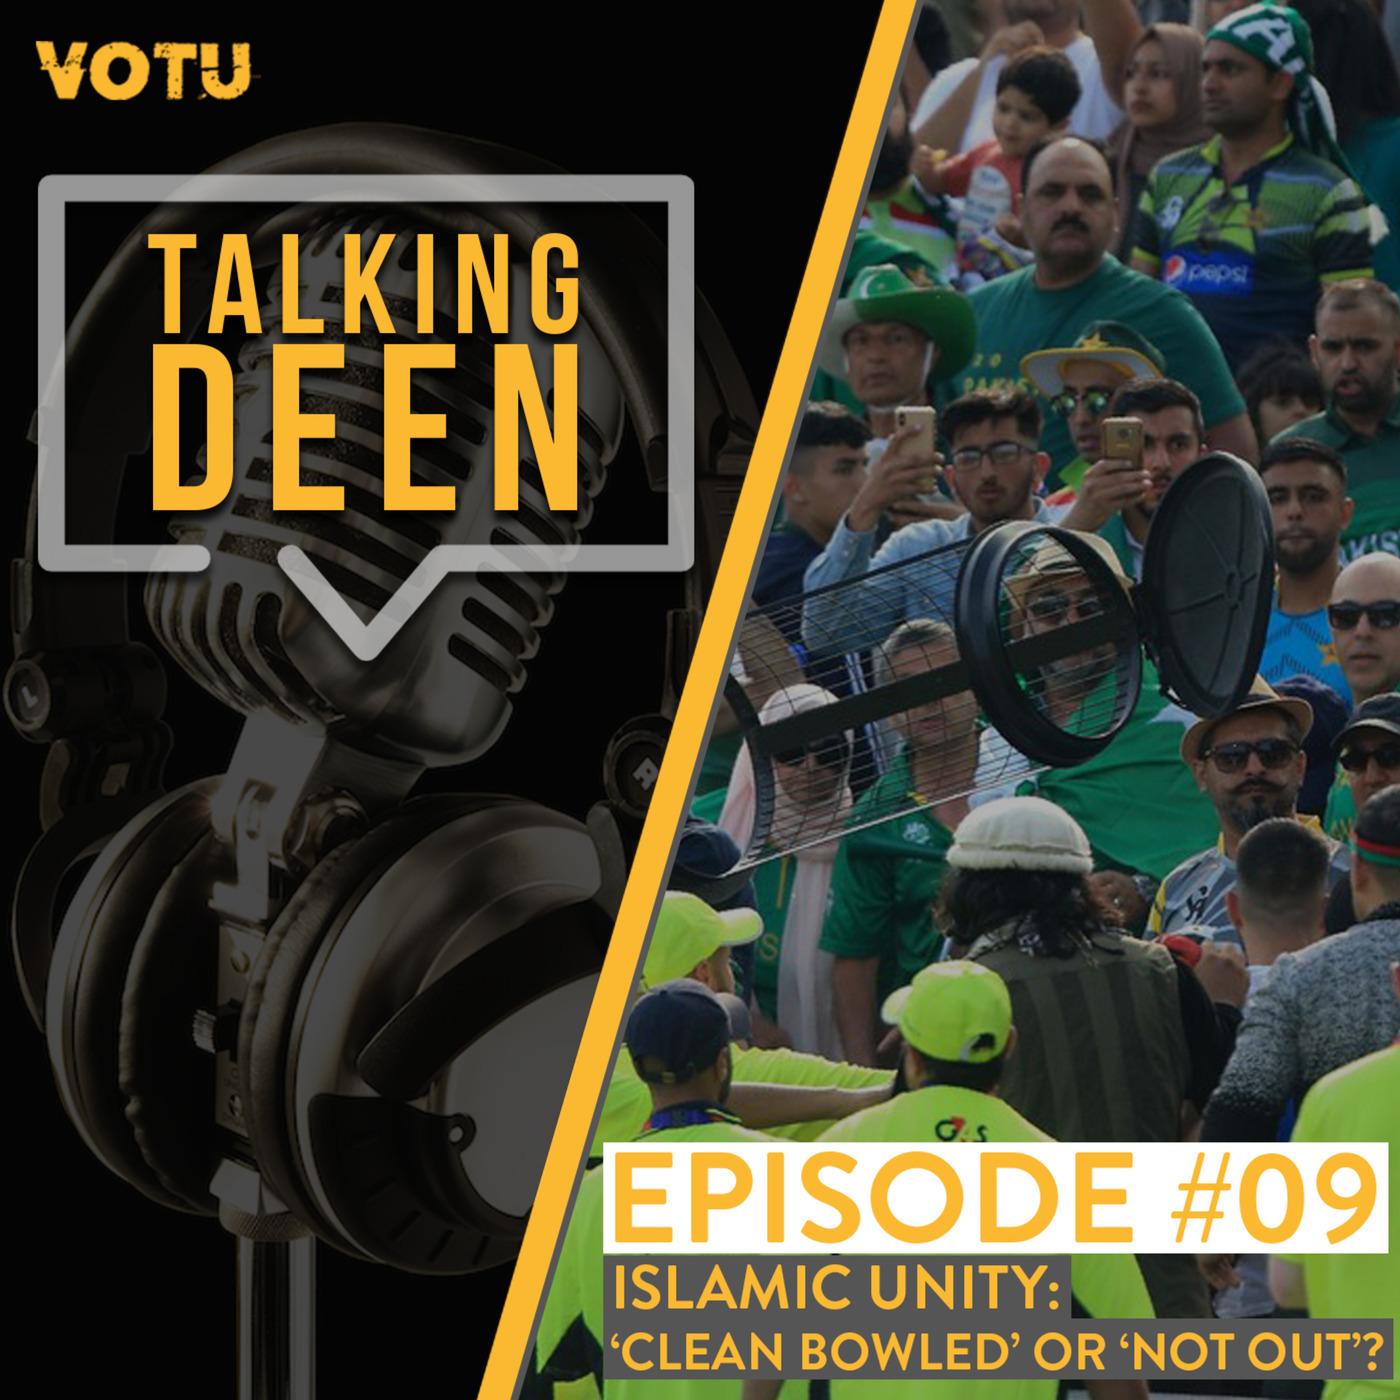 Talking Deen islamic-unity-clean-bowled-not-out: Ep 9: Islamic Unity: 'Clean Bowled' or 'Not Out'?